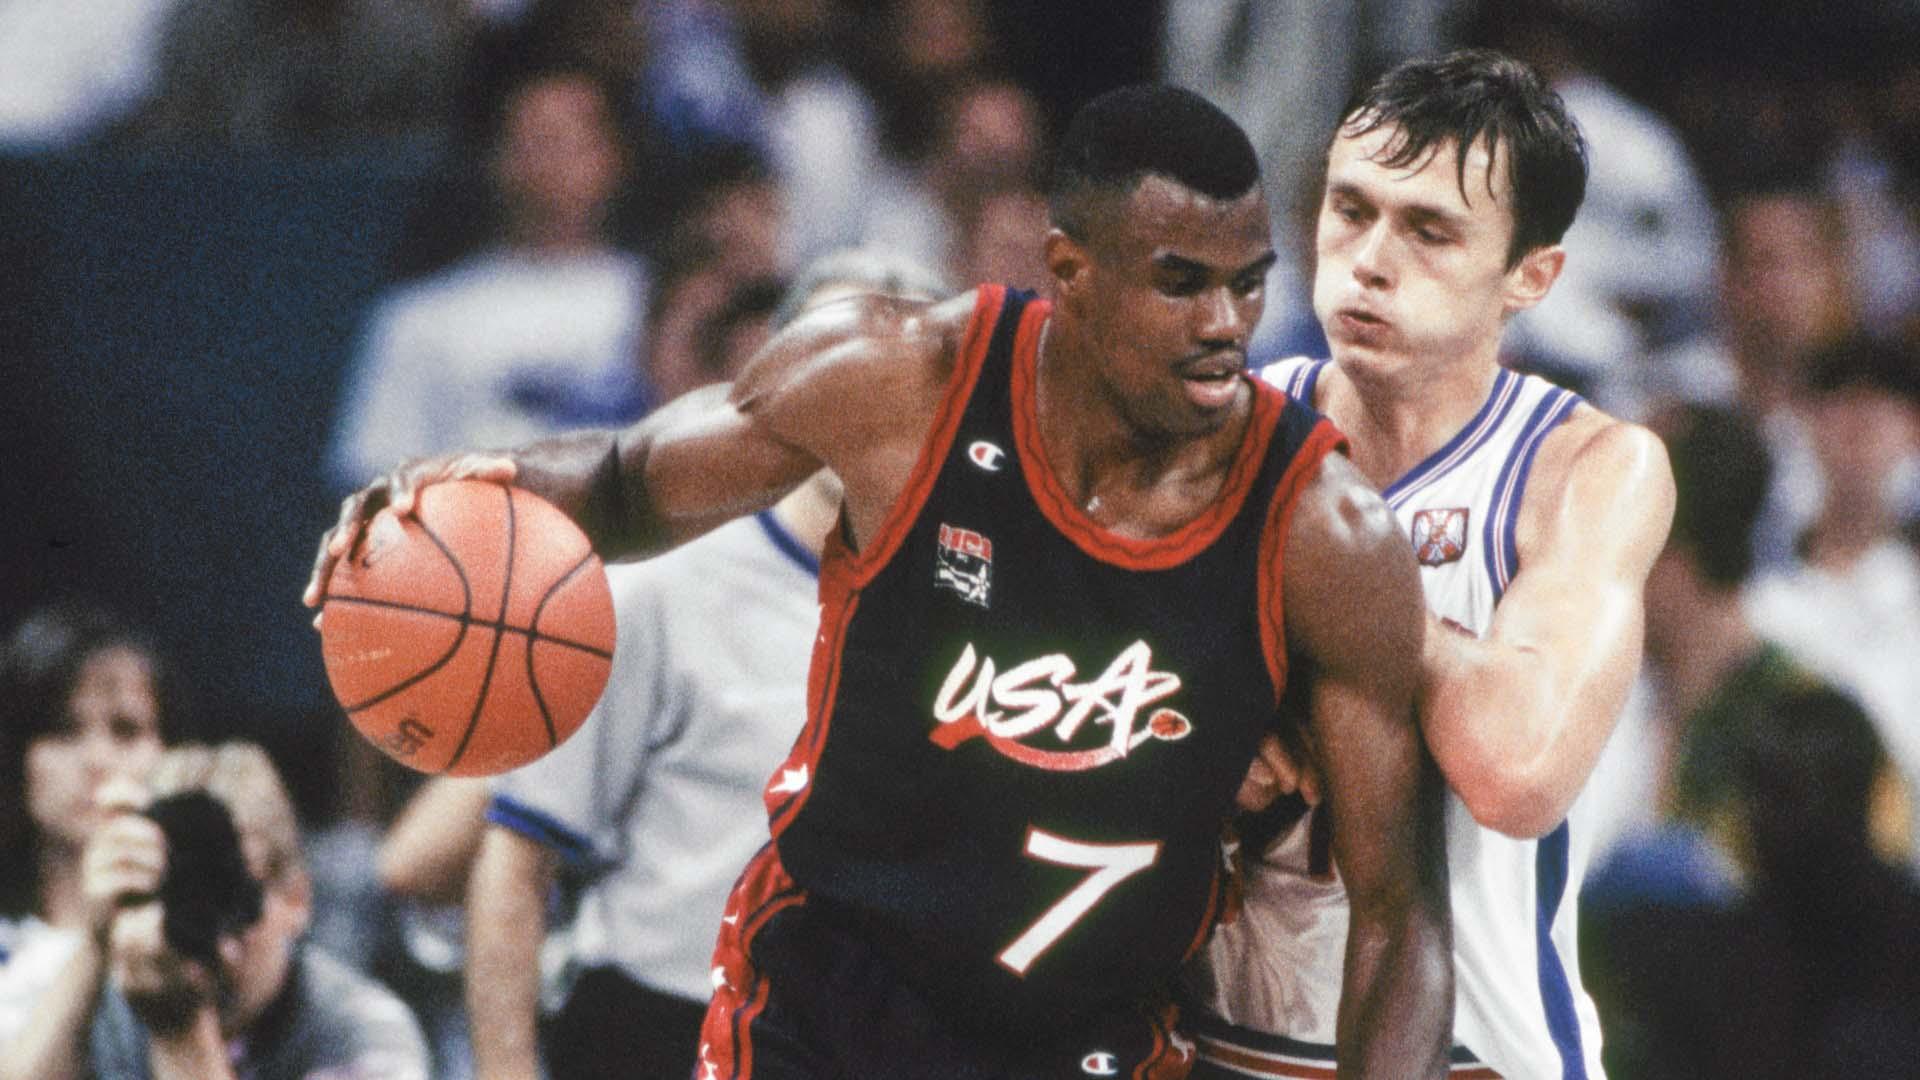 melhores jogadores de basquete dos estados unidos david robinson